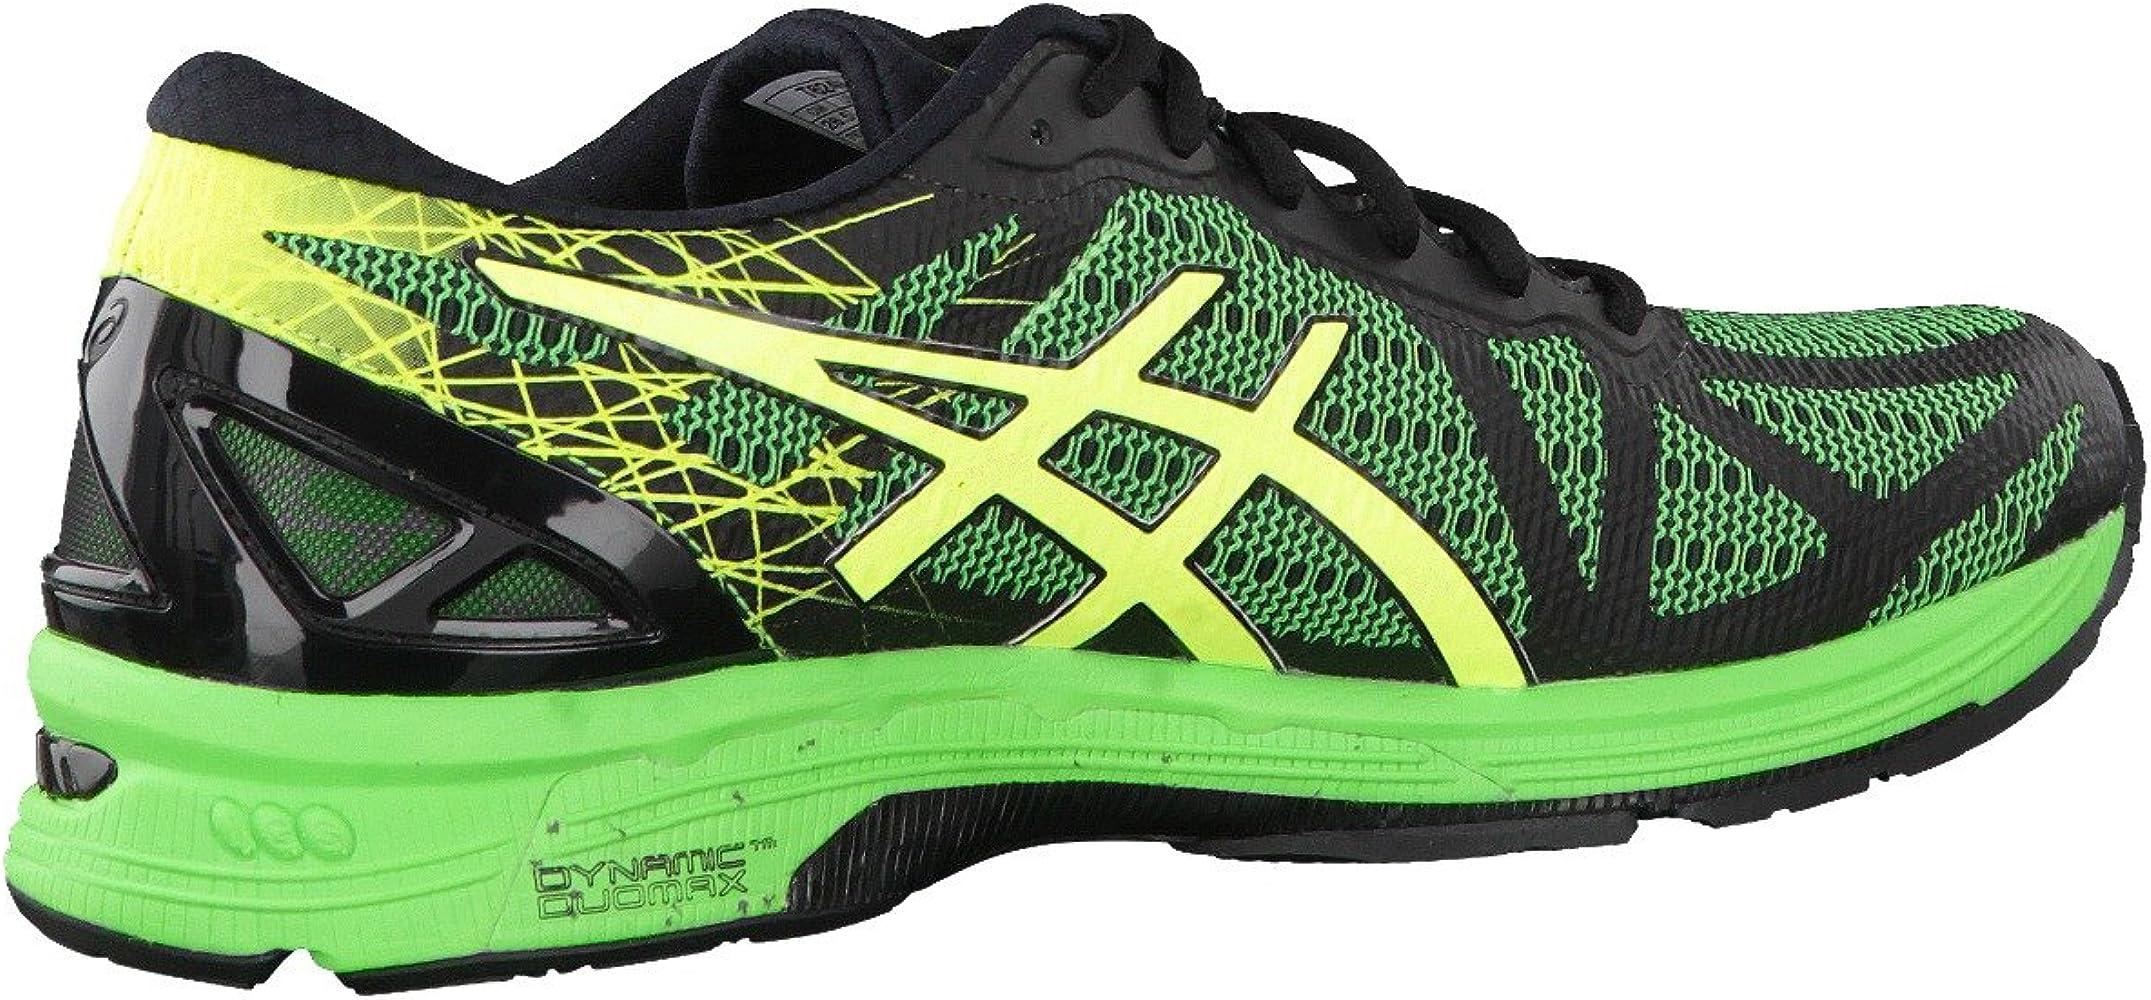 ASICS GEL DS TRAINER 21 VERDE T624N 9007: Amazon.es: Zapatos y complementos